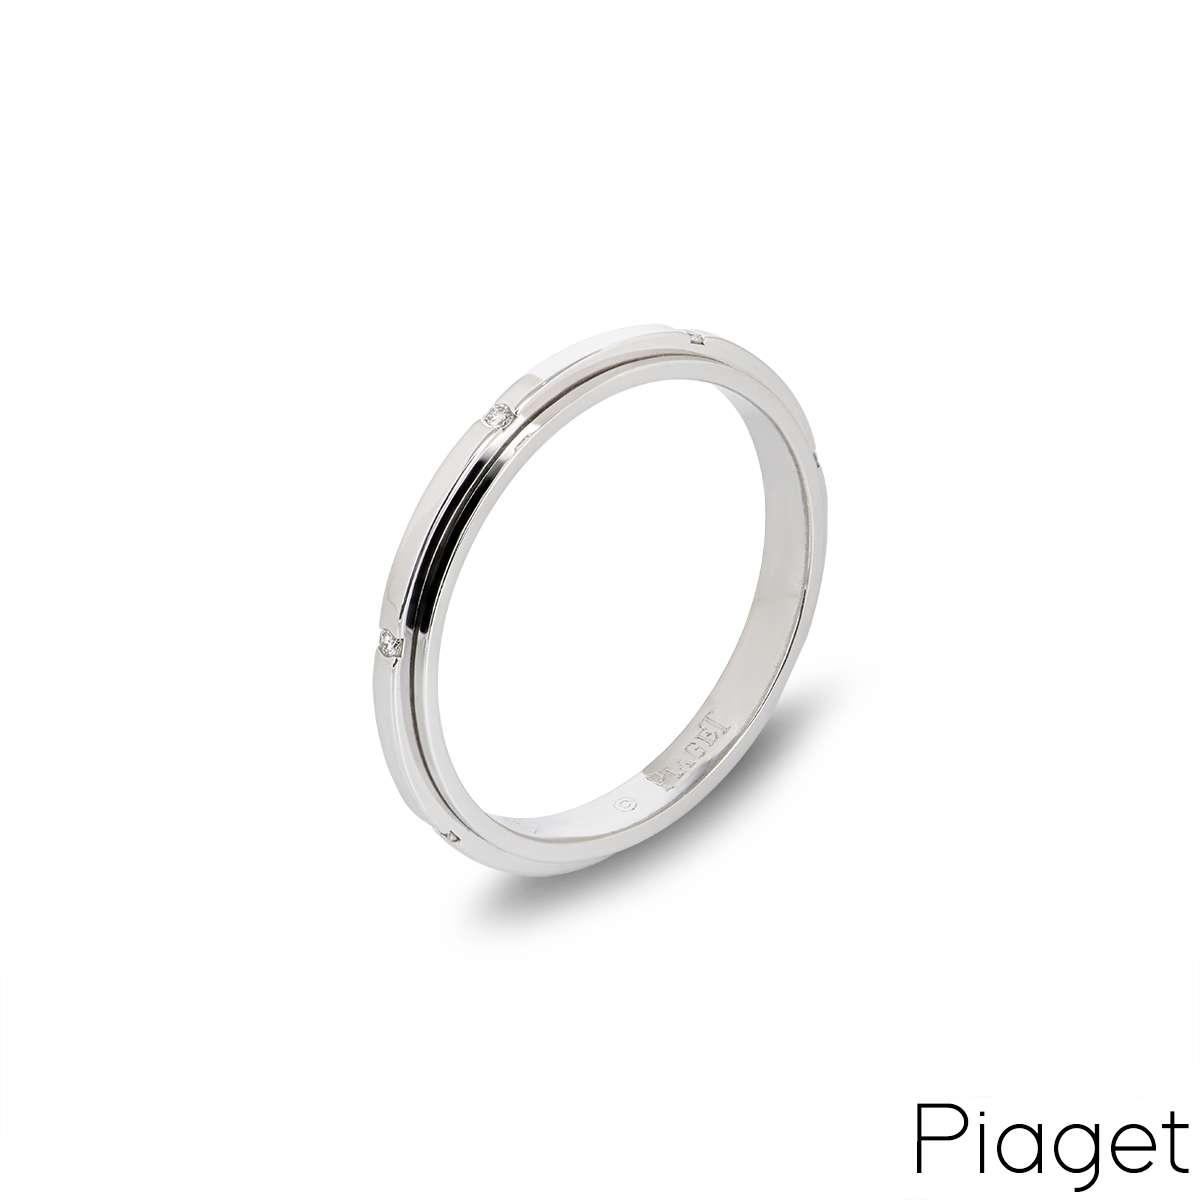 Piaget  White Gold Diamond Possession Ring G34PR500